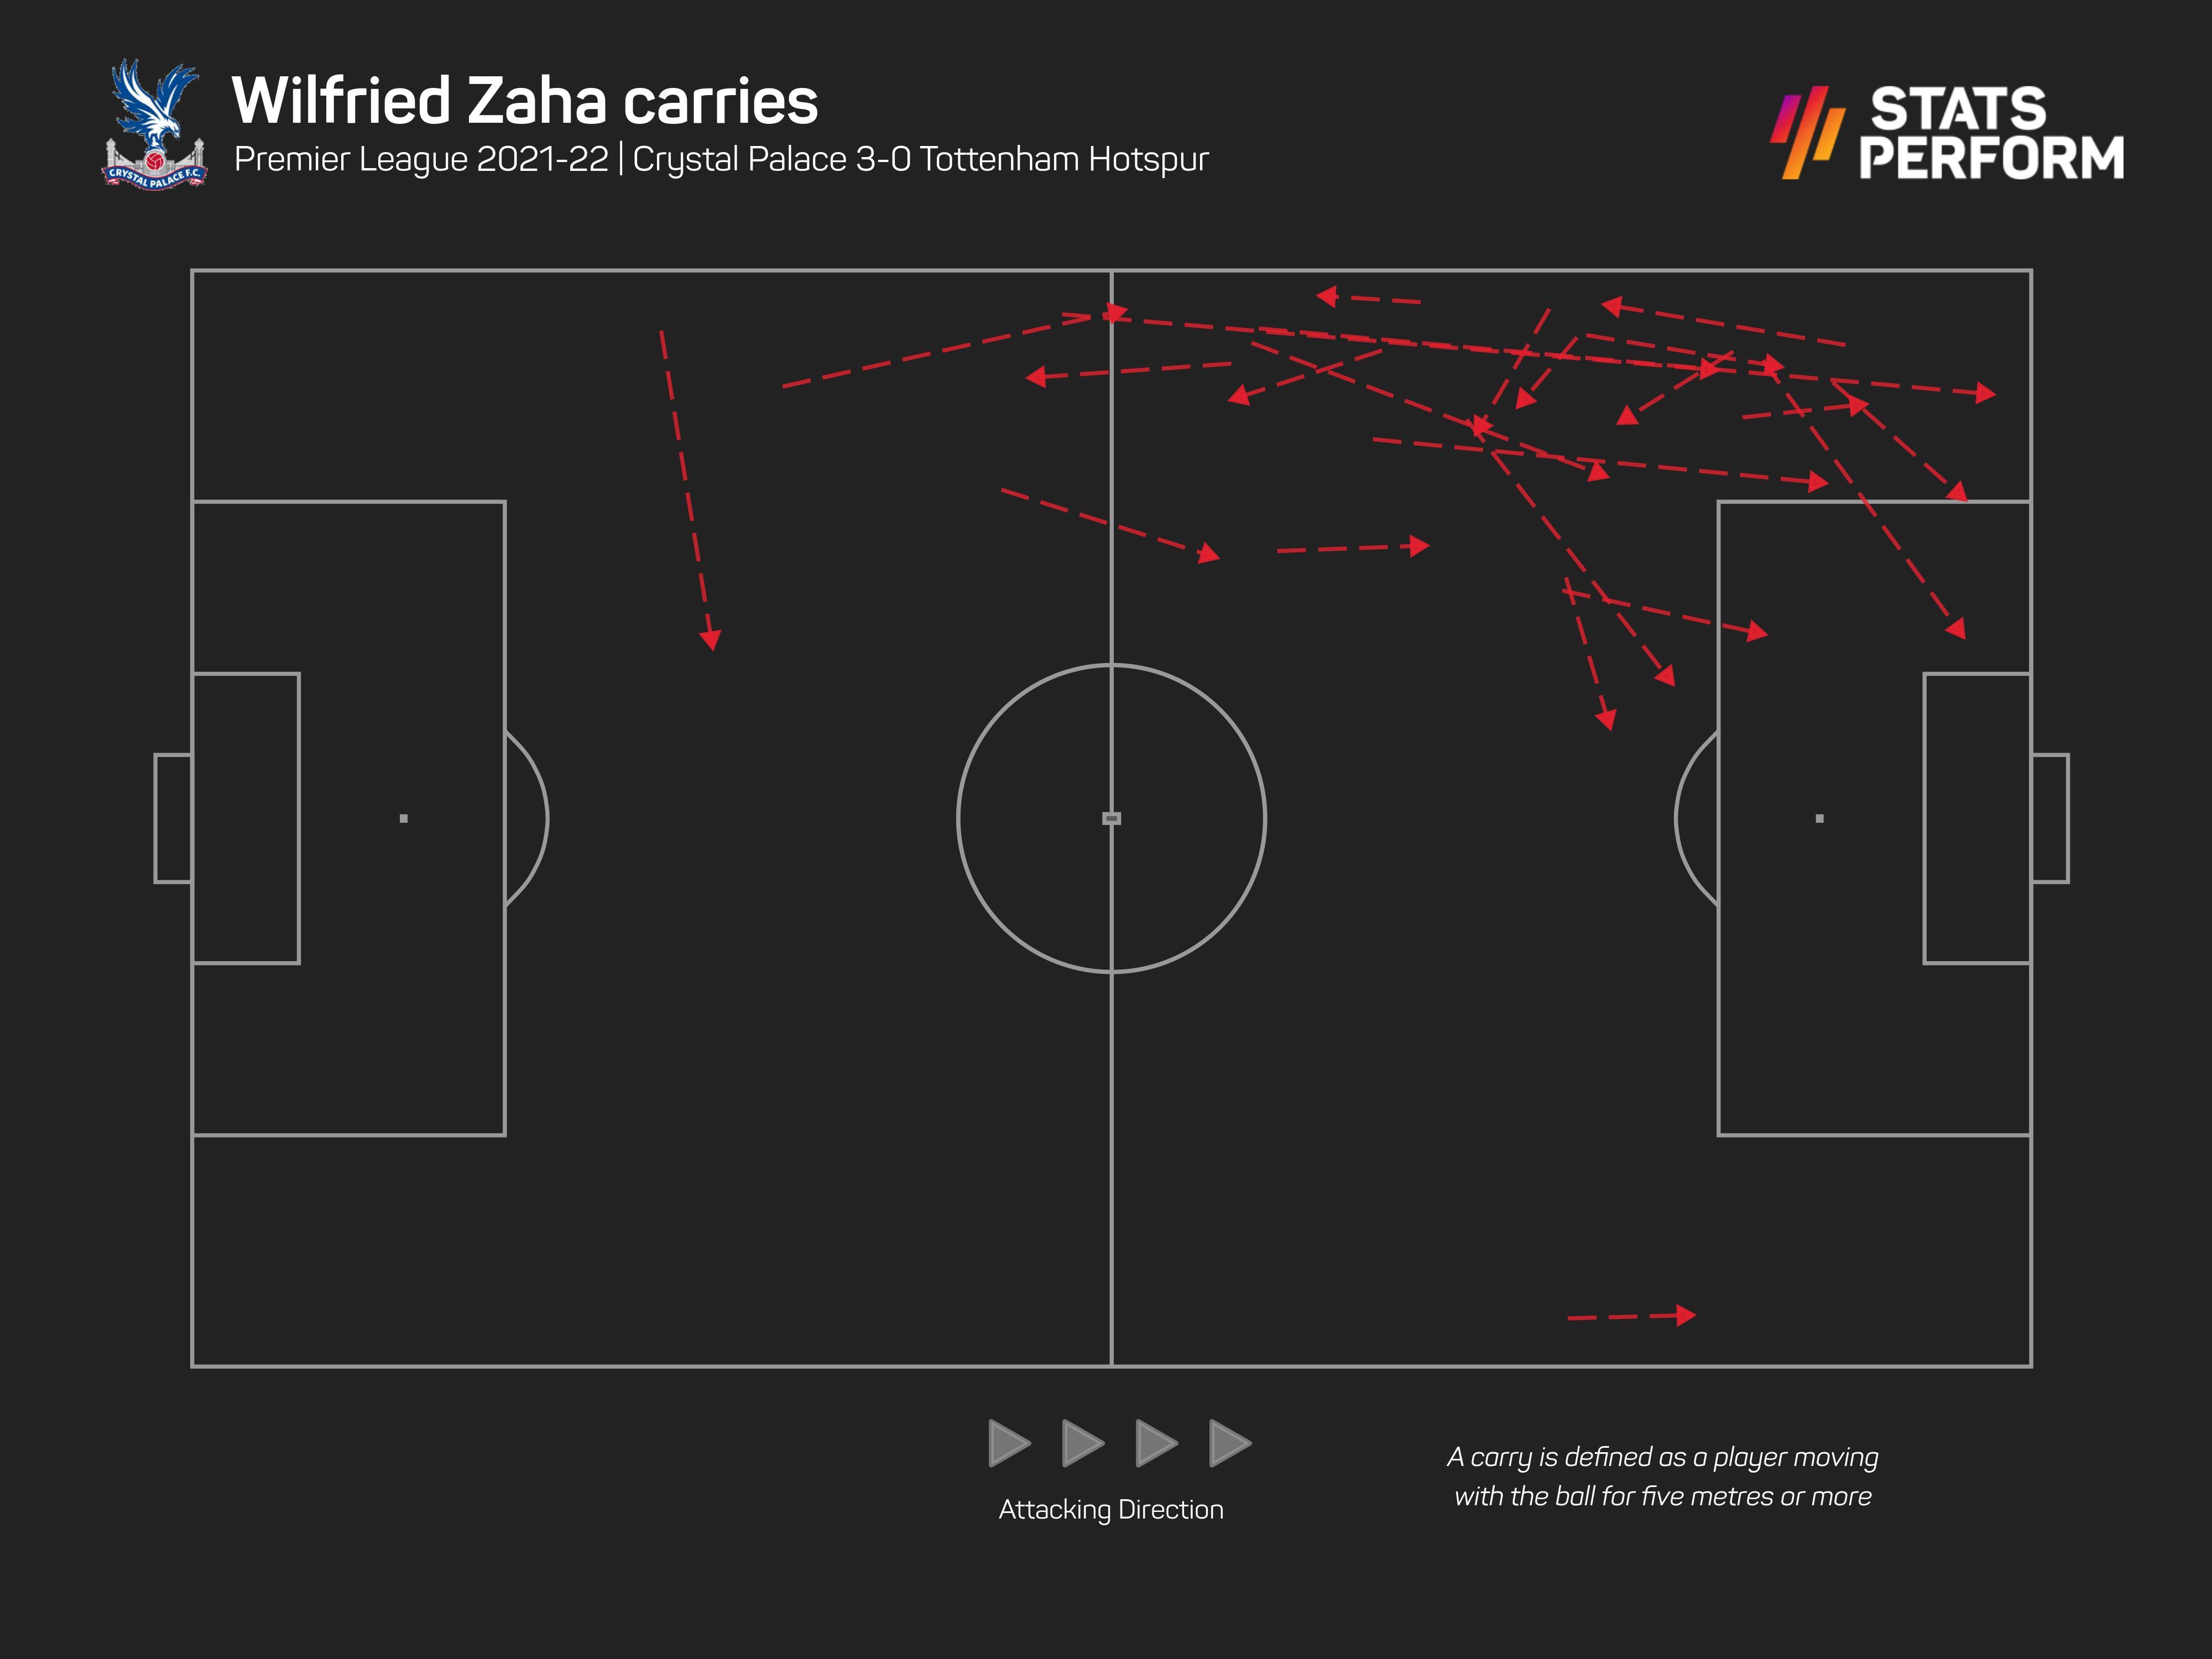 Wilfried Zaha ball carries